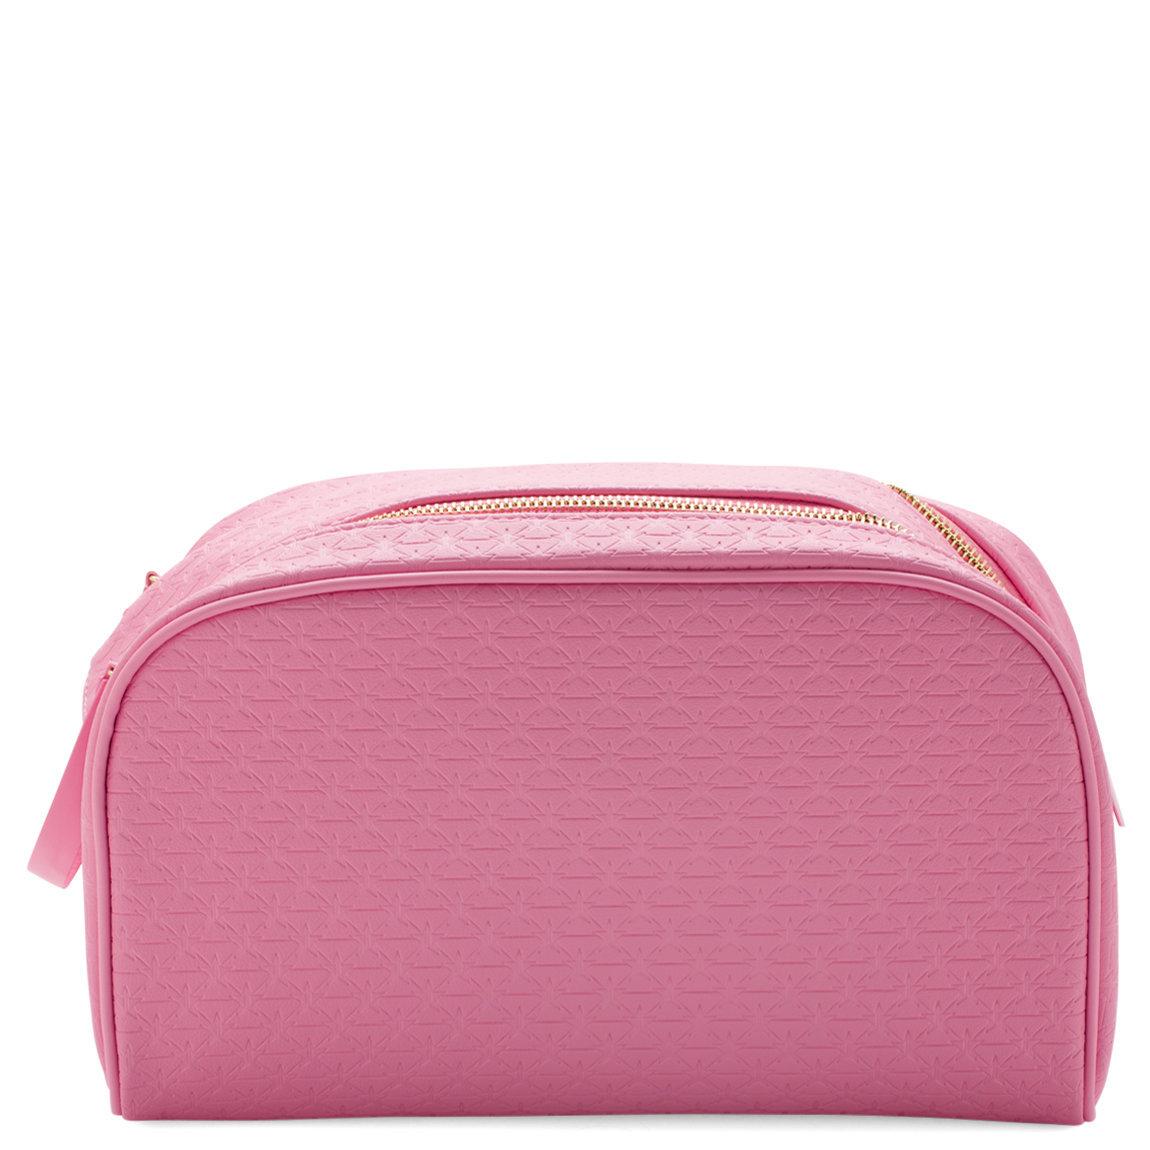 Jeffree Star Cosmetics Double Zip Makeup Bag Pink product swatch.